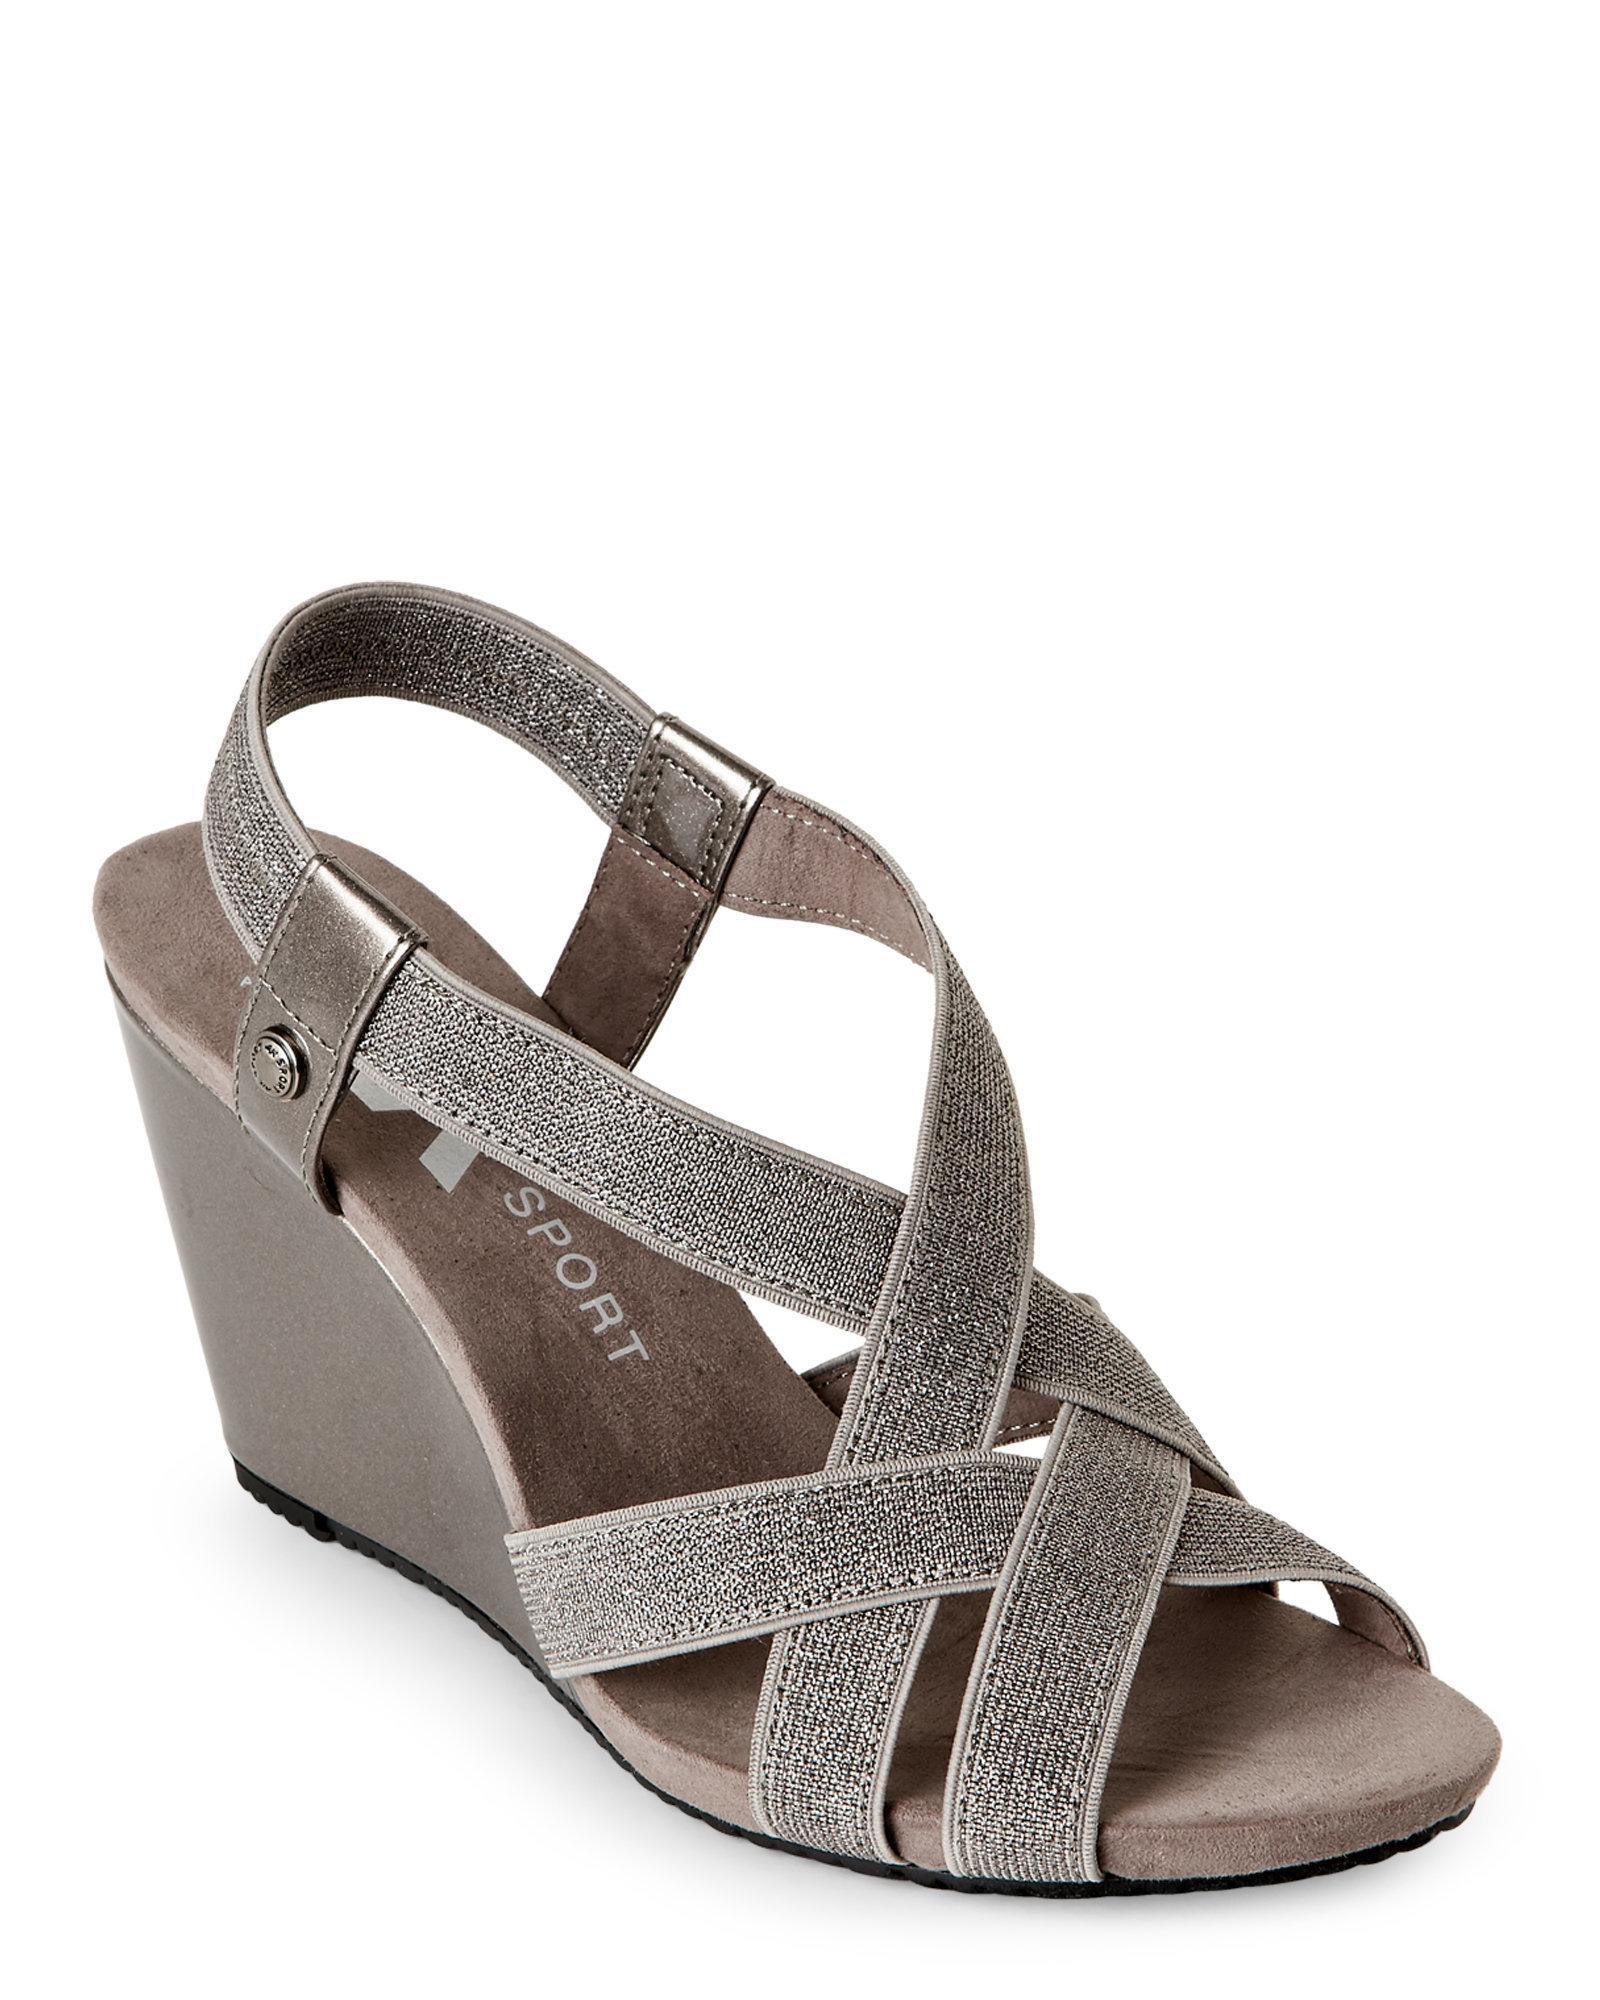 0764406623b Lyst - Ak Anne Klein Pewter Tamryn Wedge Sandals